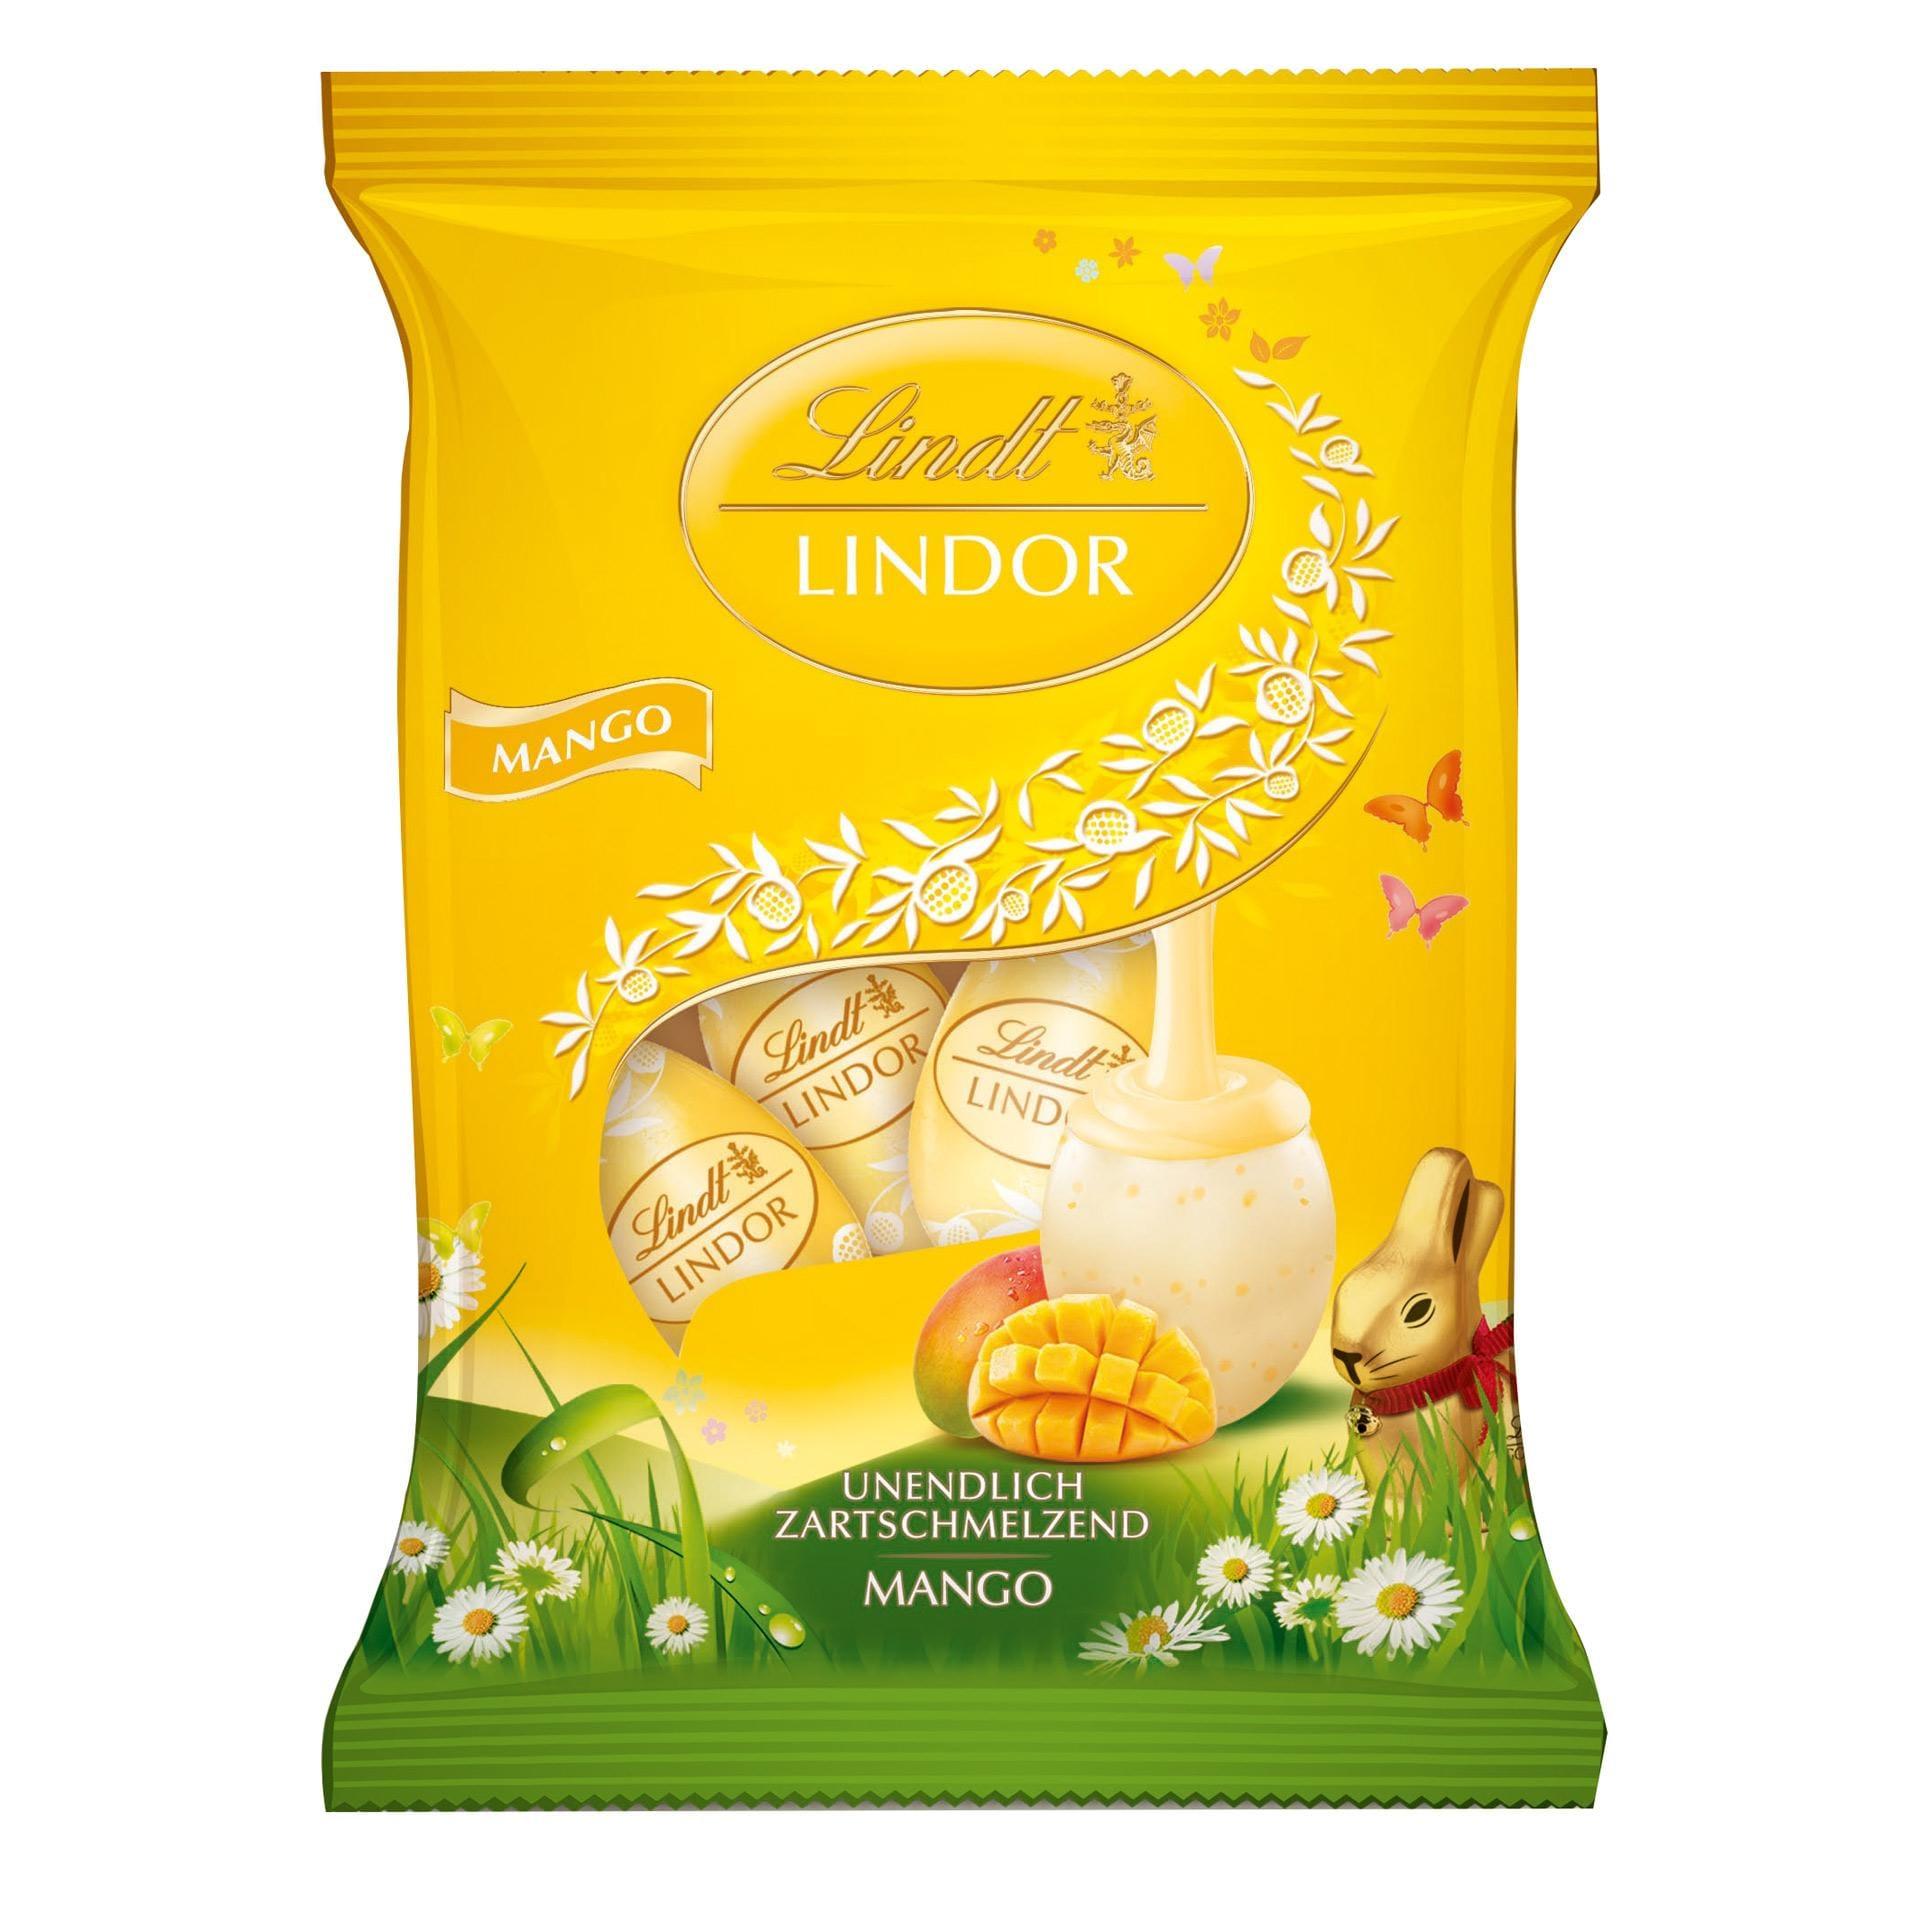 Lindt Lindor Eier Mango Schokoladeneier 90g, 5 Stück